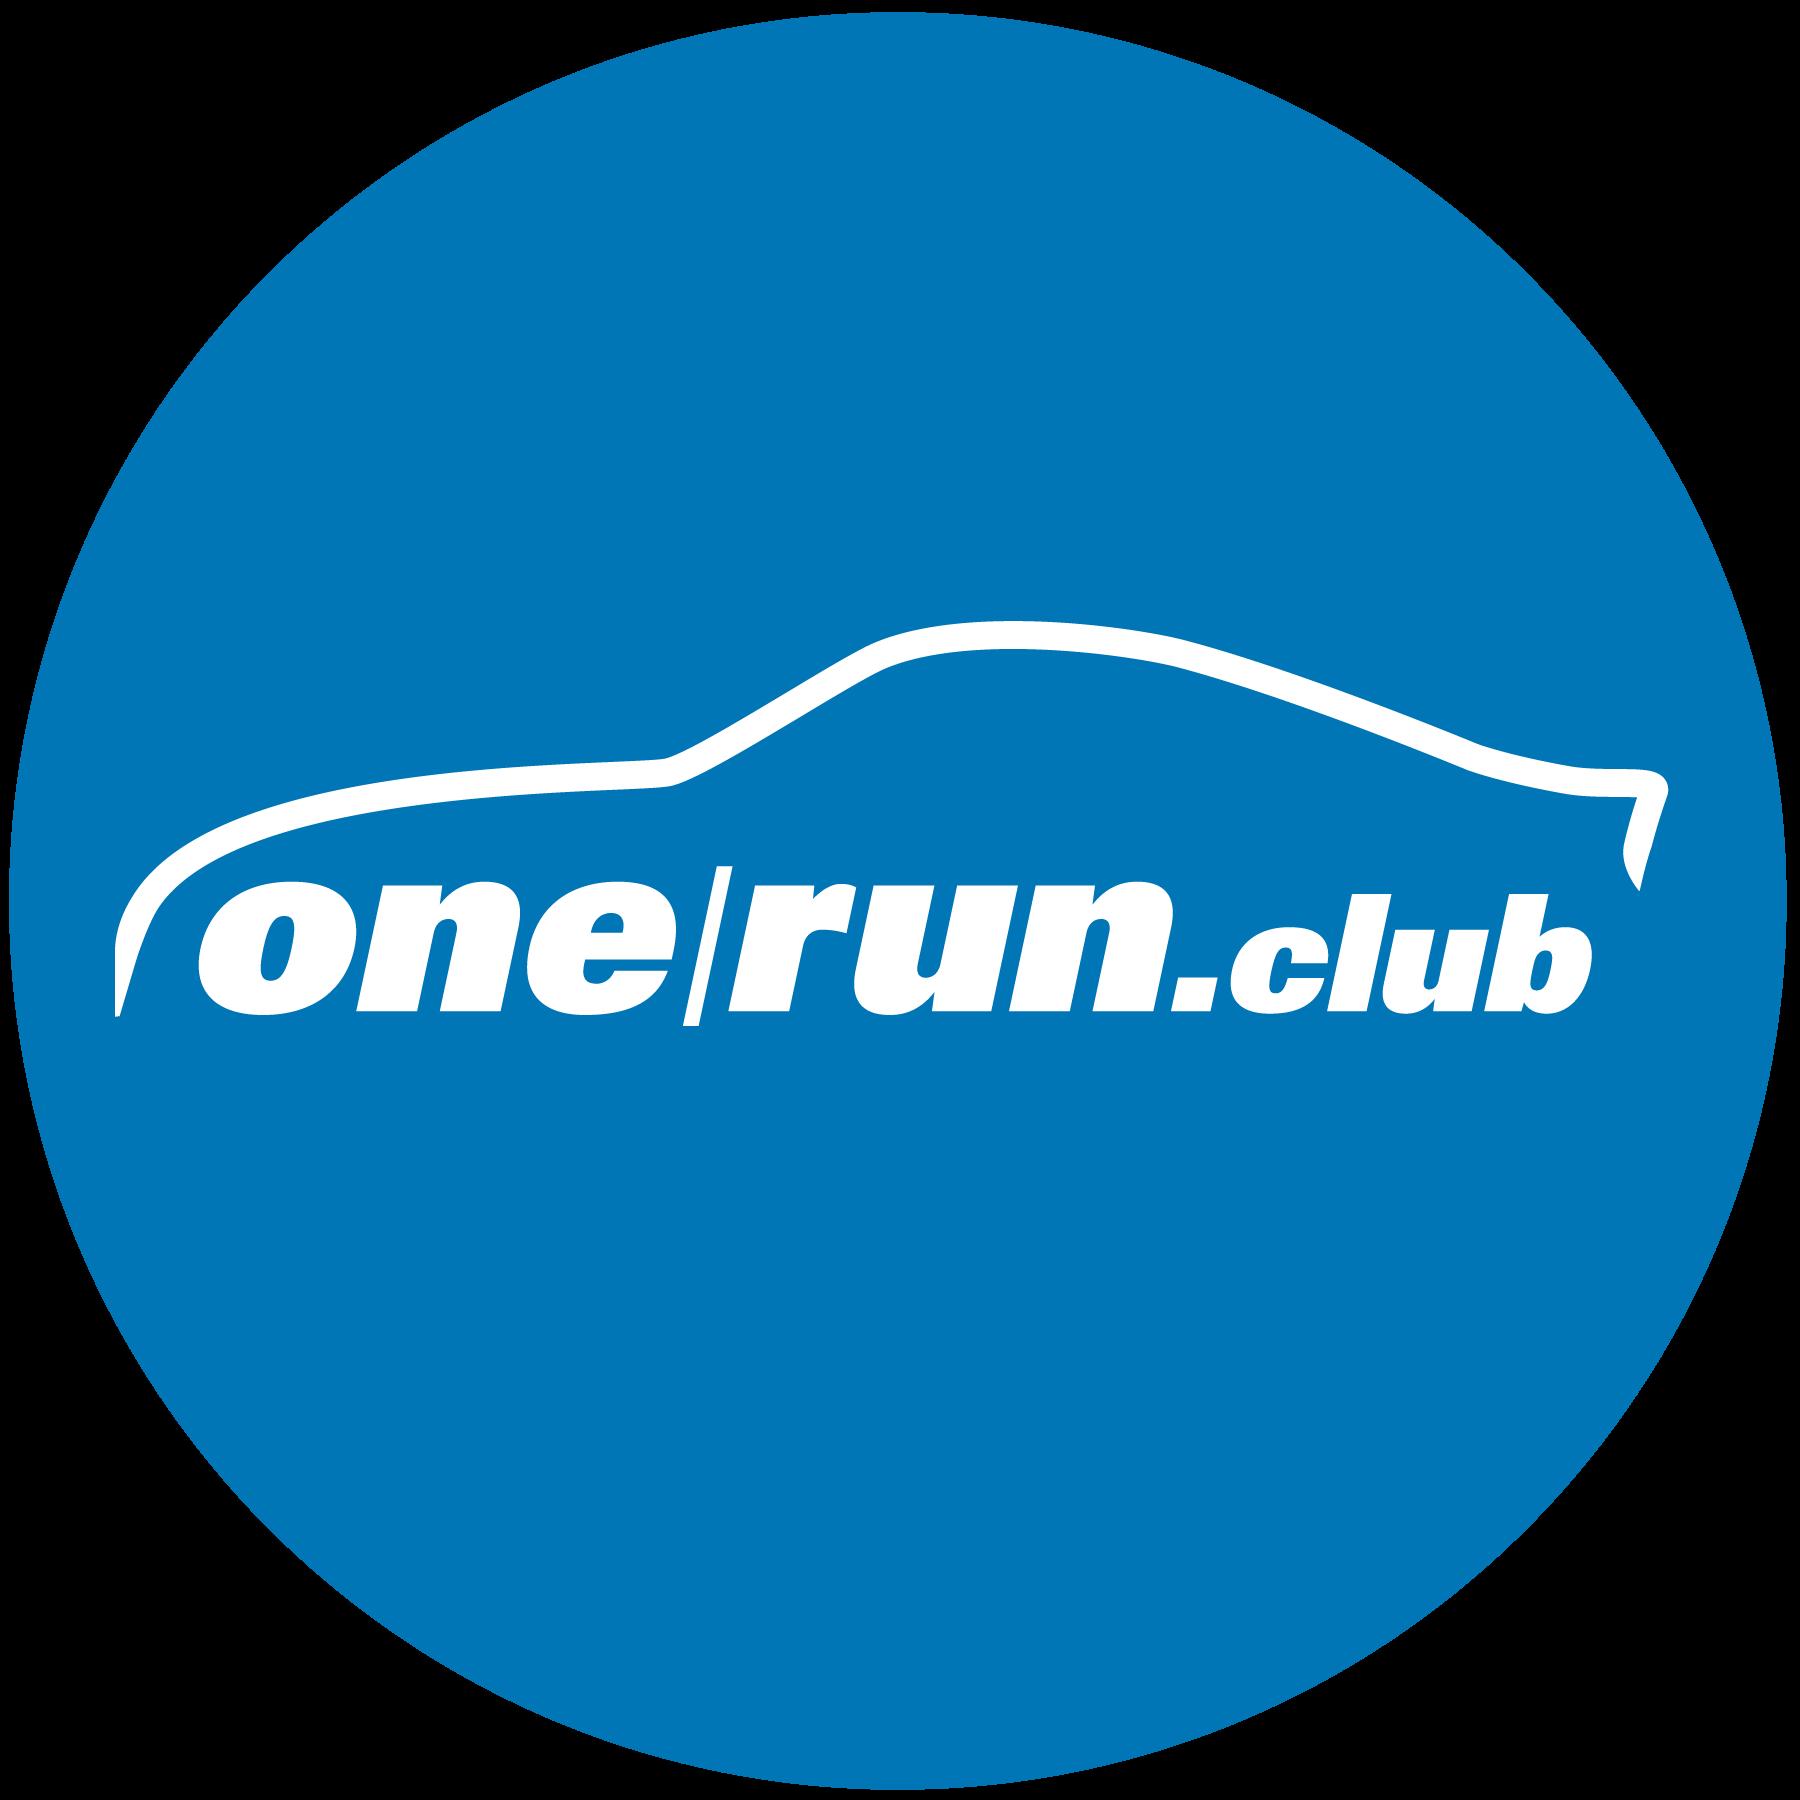 OneRunClub-LogoBlueCircle(6x6)-300.png